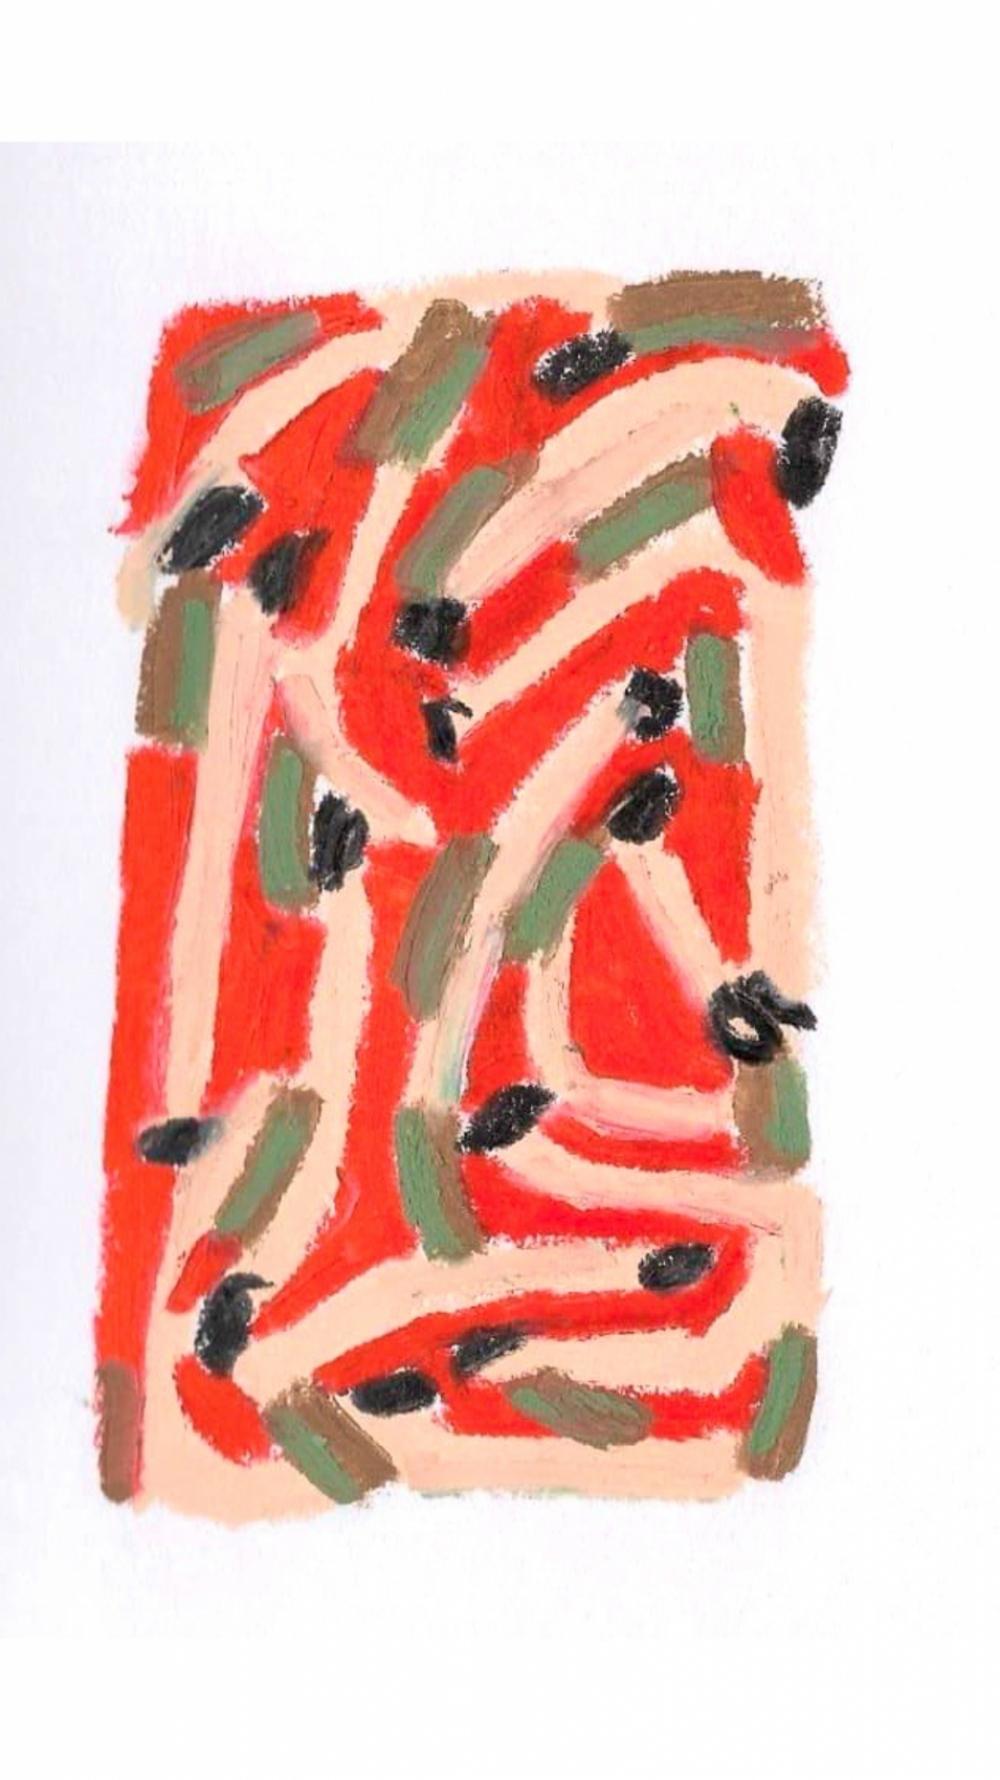 Anna Choutova - Cigarette Snakes 14 Oil Pastel on Paper21 cm x 15 cm